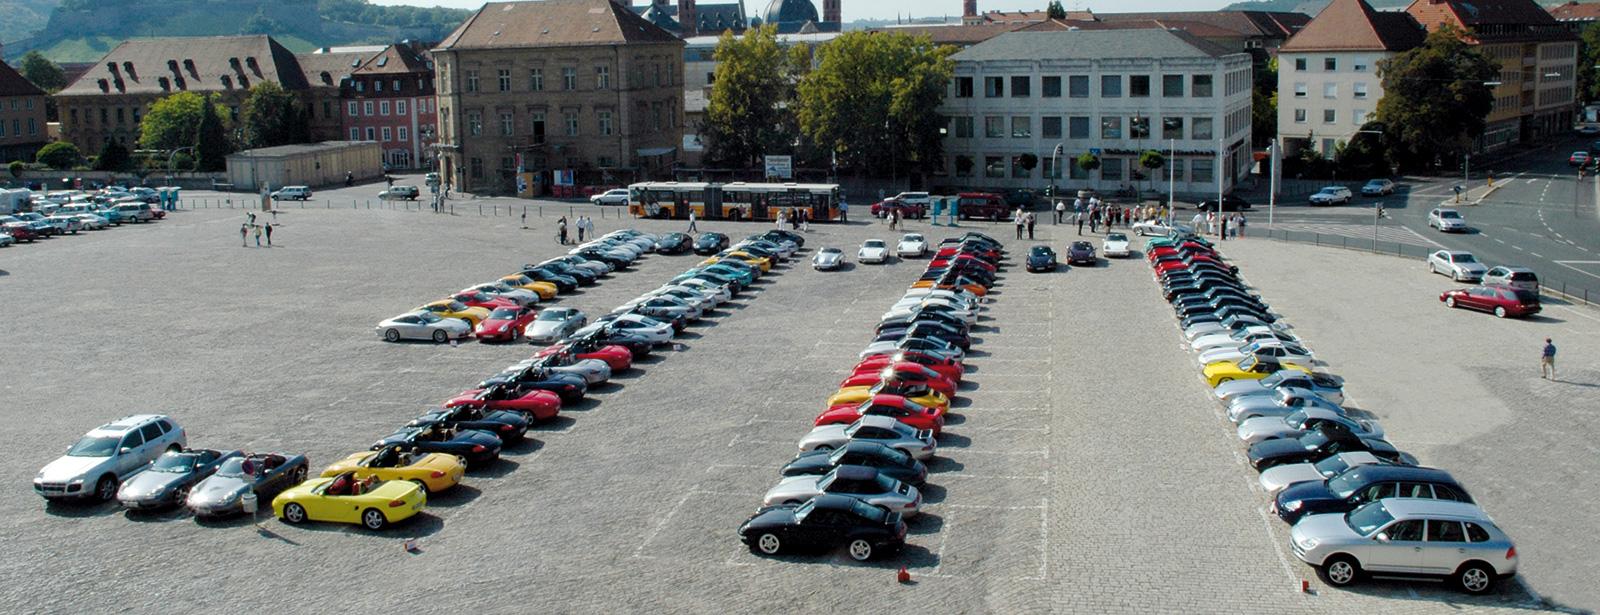 Porsche Club Rems - Jagst e.V.